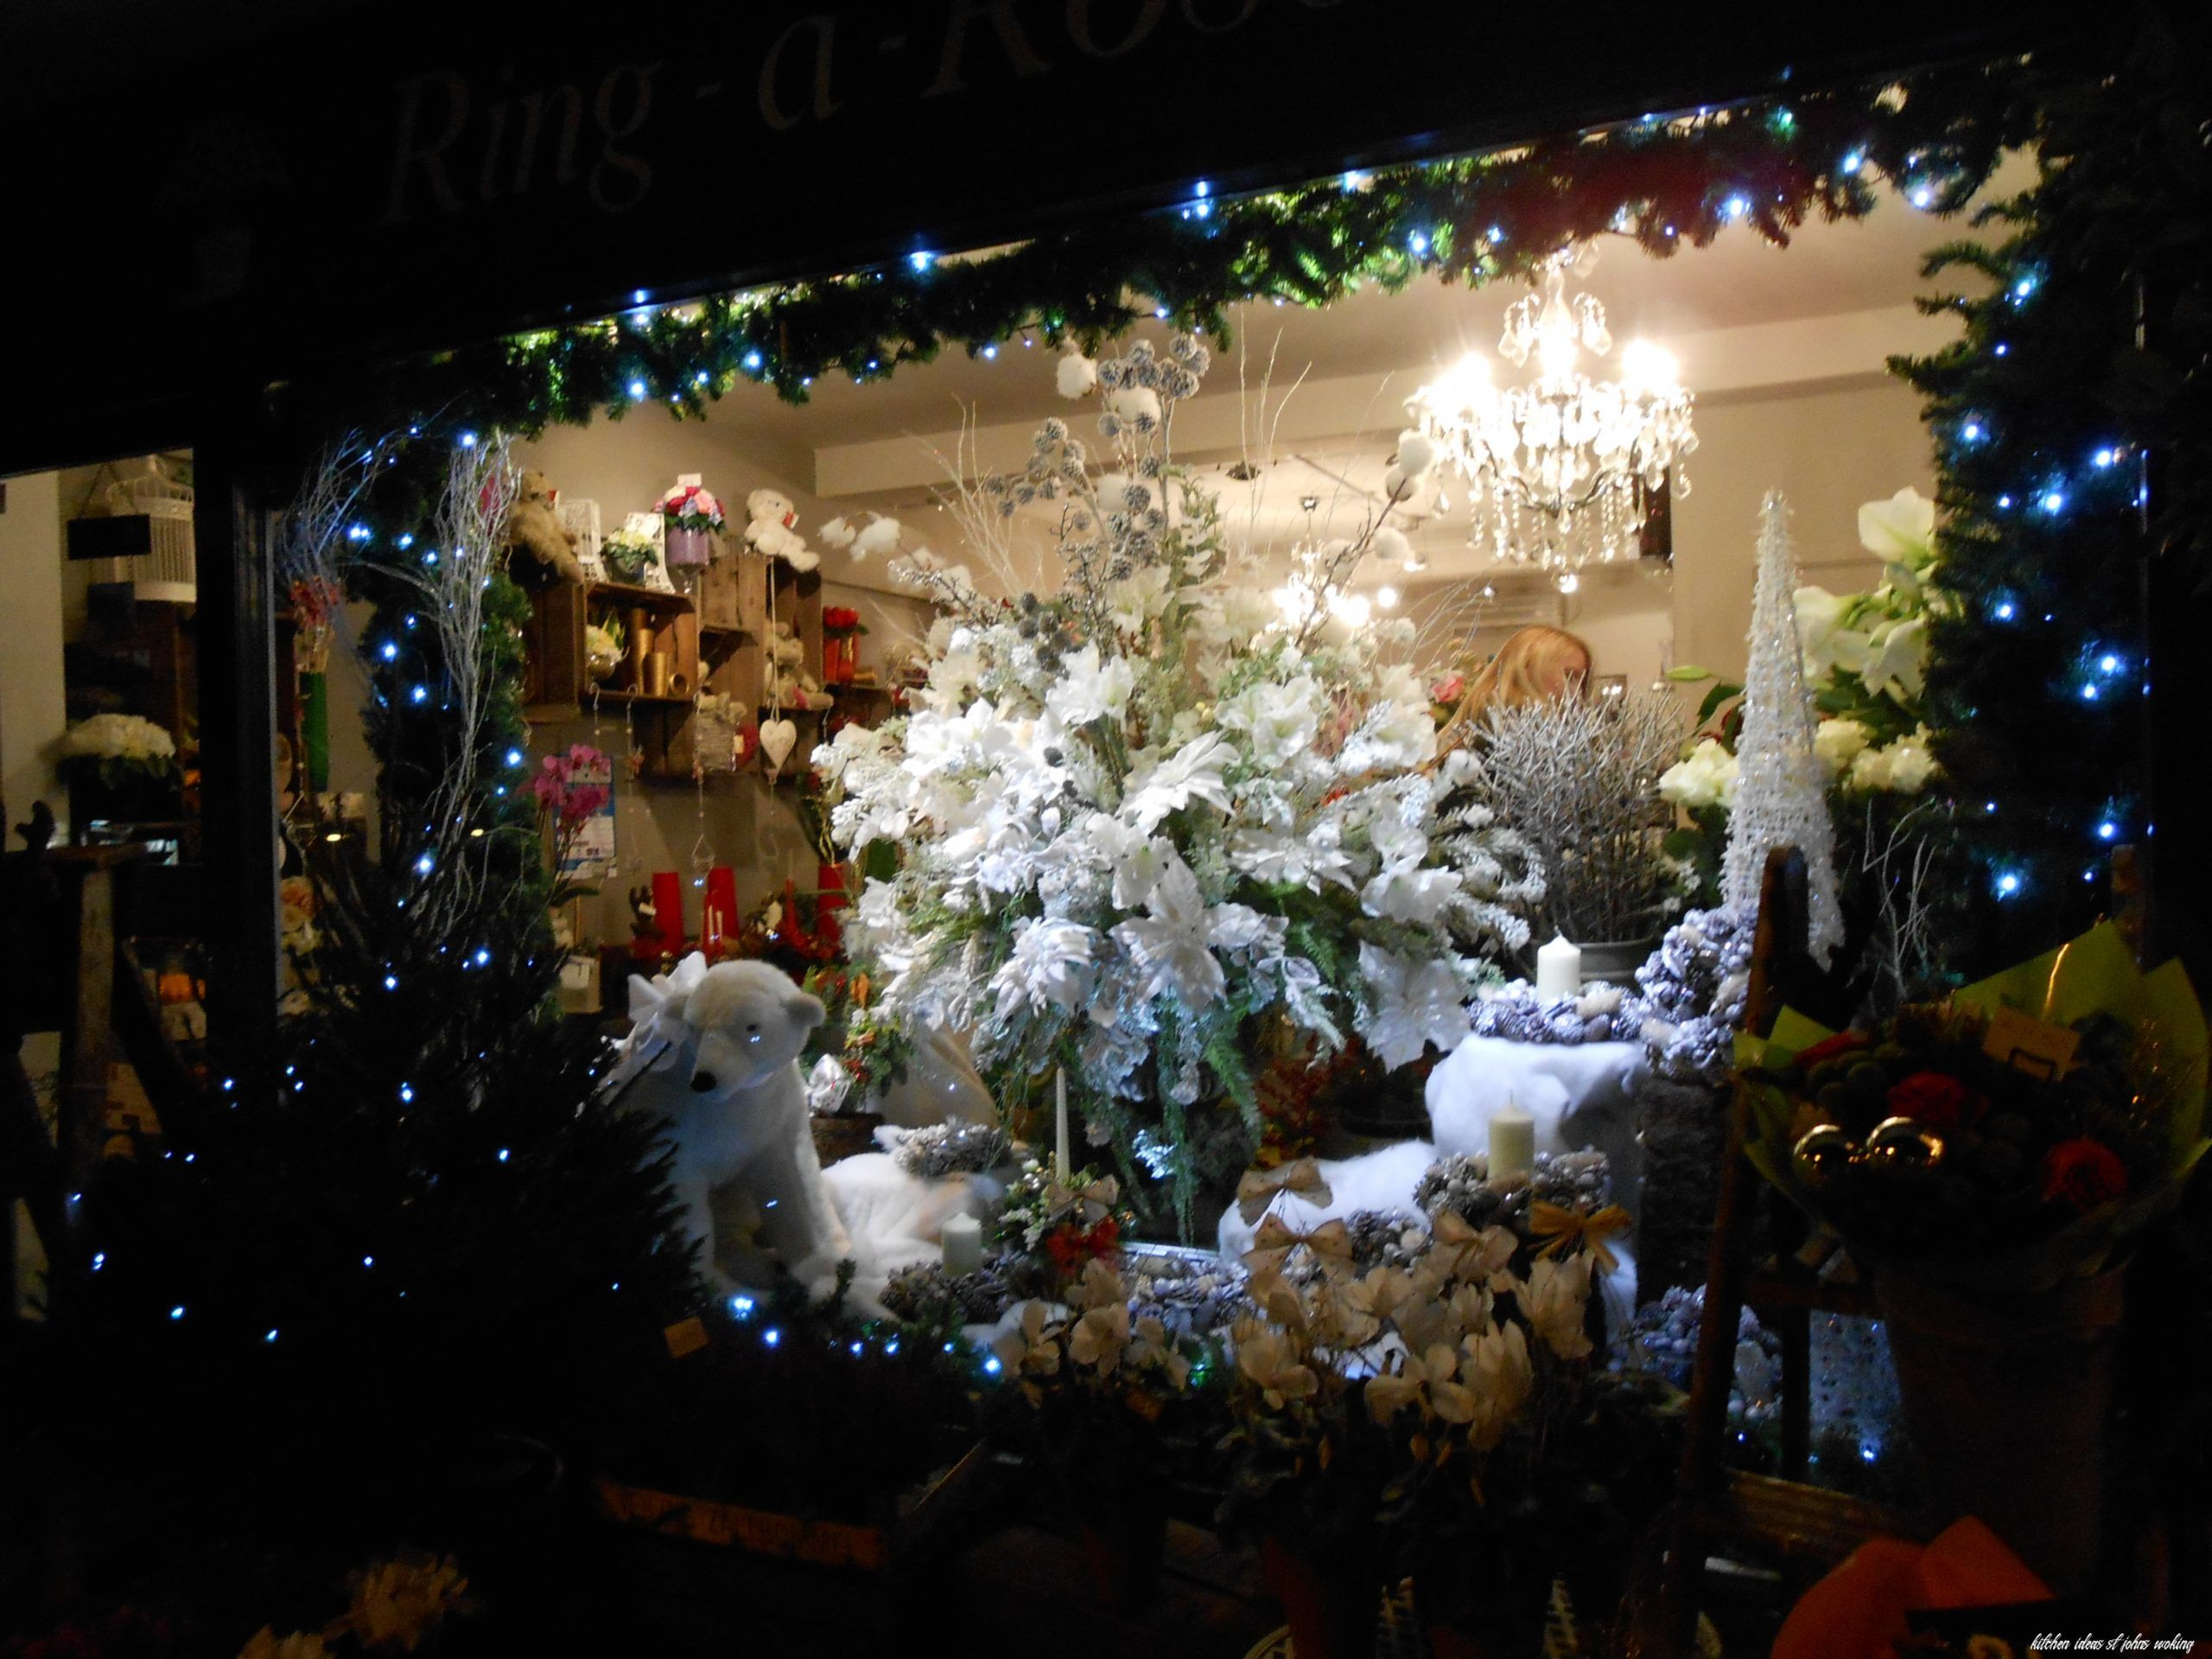 9 Kitchen Ideas St Johns Woking In 2020 Holiday Decor Christmas Tree St John